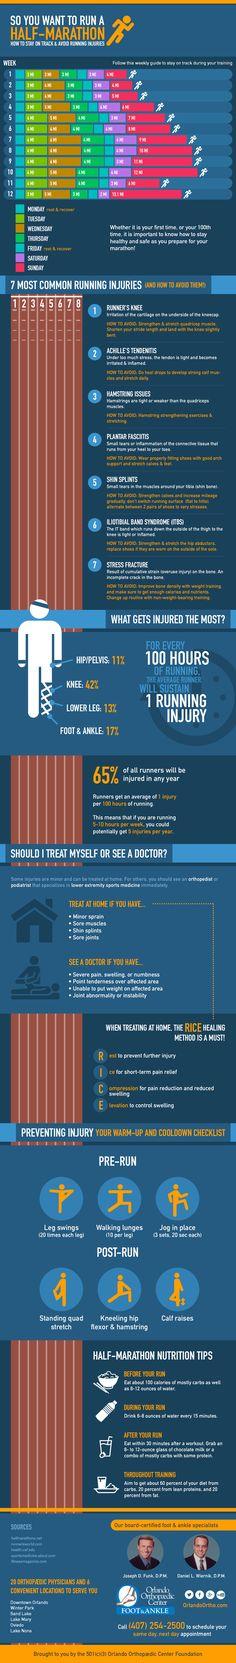 Half Marathon Training Injury Prevention Infographic